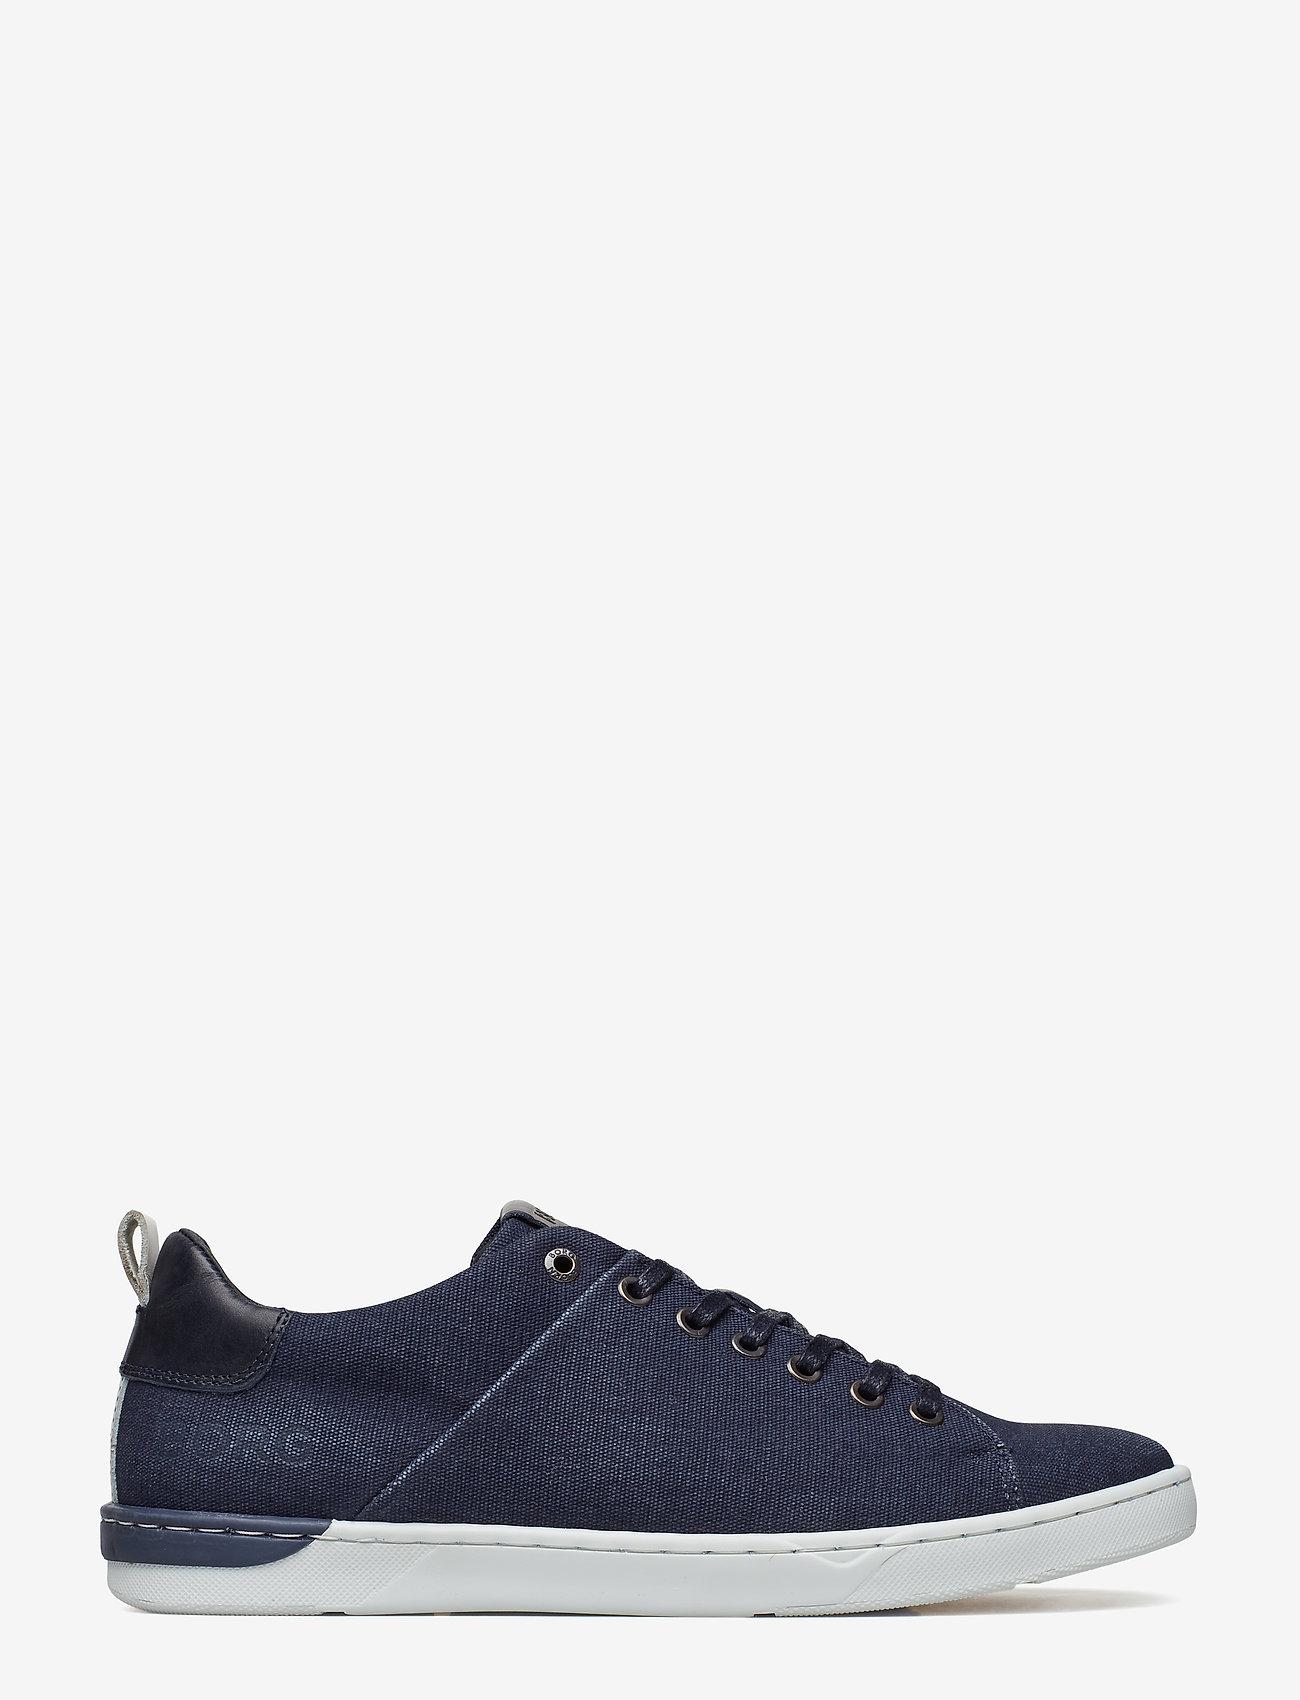 Björn Borg - Kendrick Cvs M - laag sneakers - navy - 1